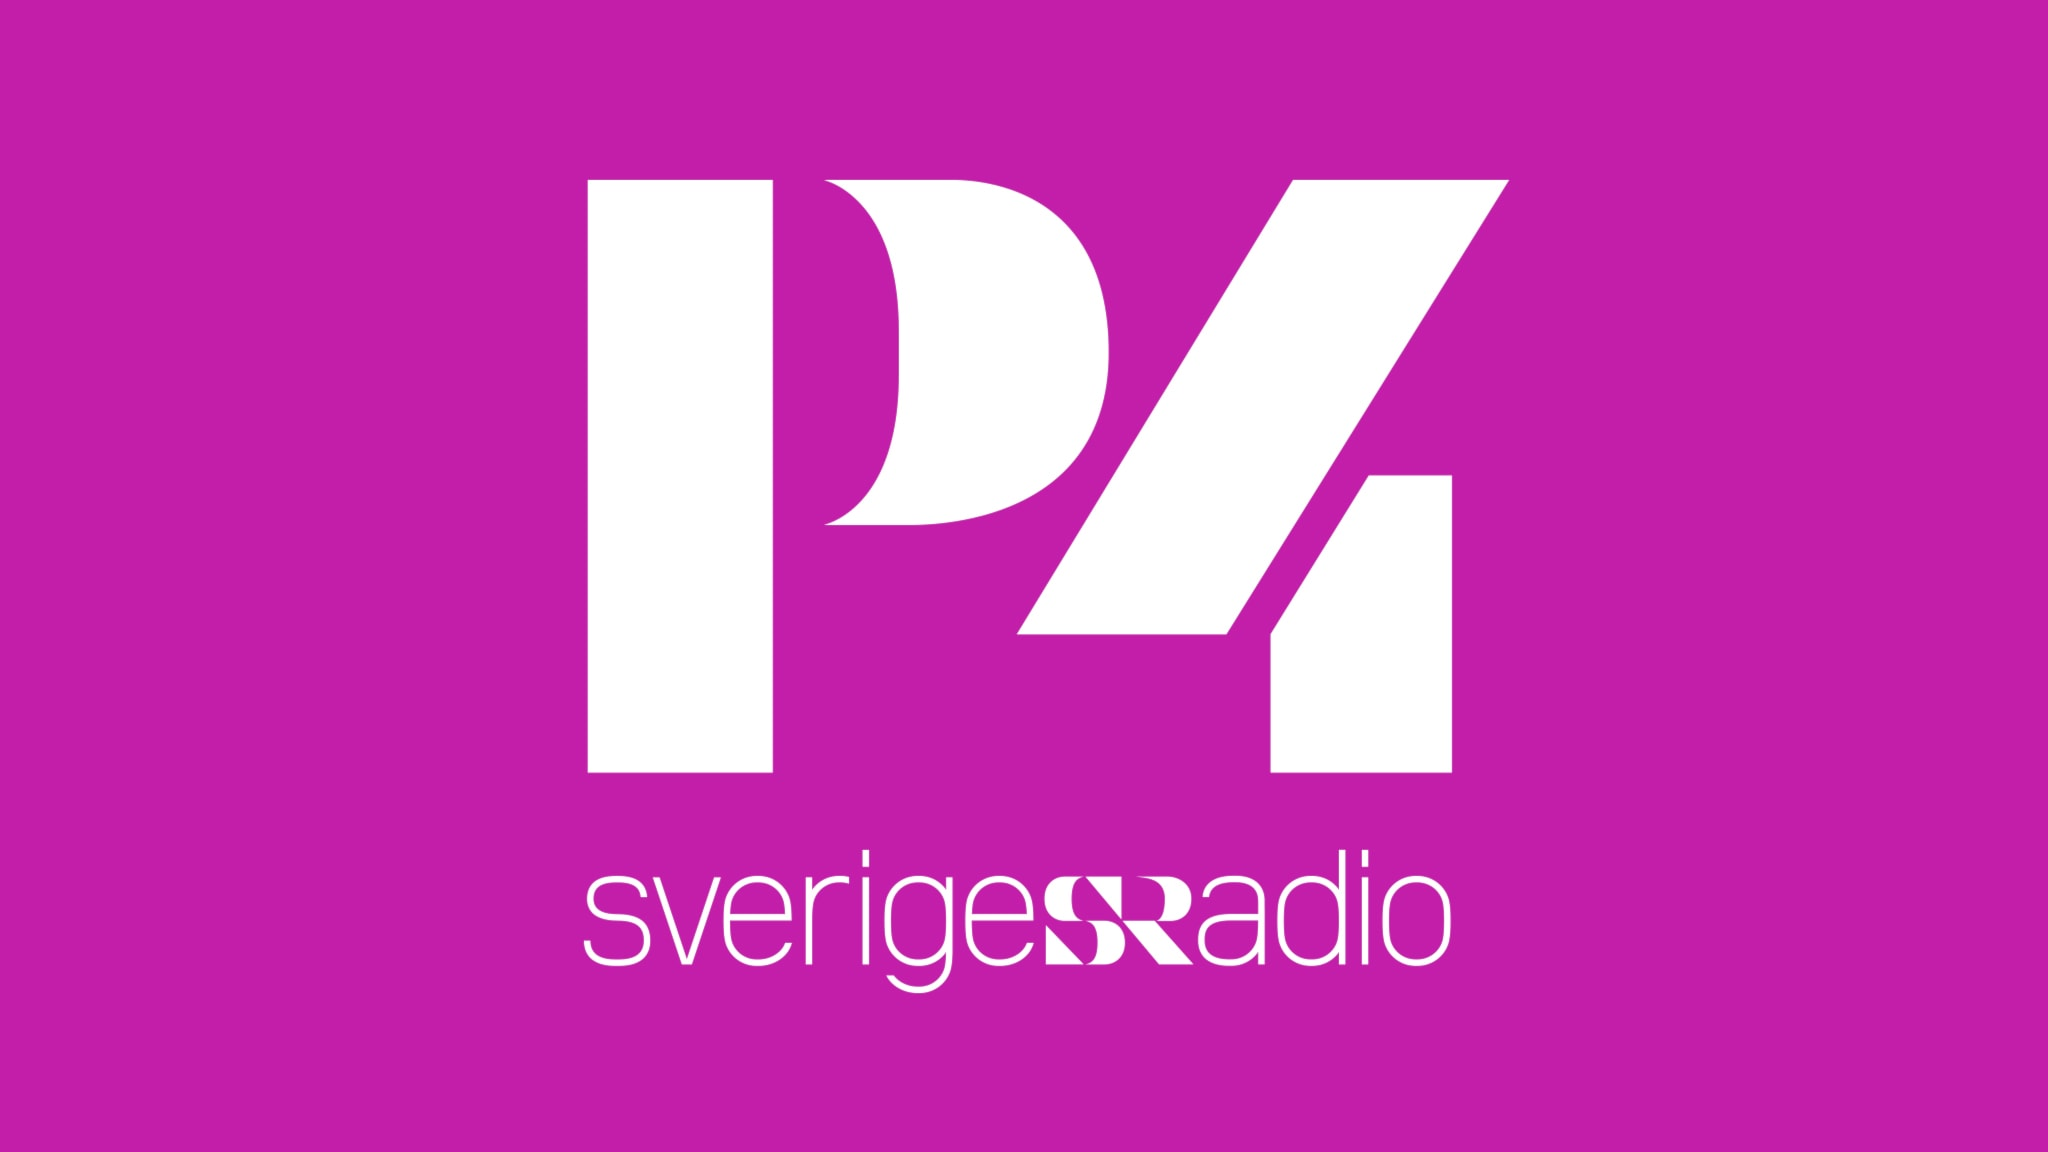 Trafik P4 Göteborg 20190626 10.21 (00.25) - spela